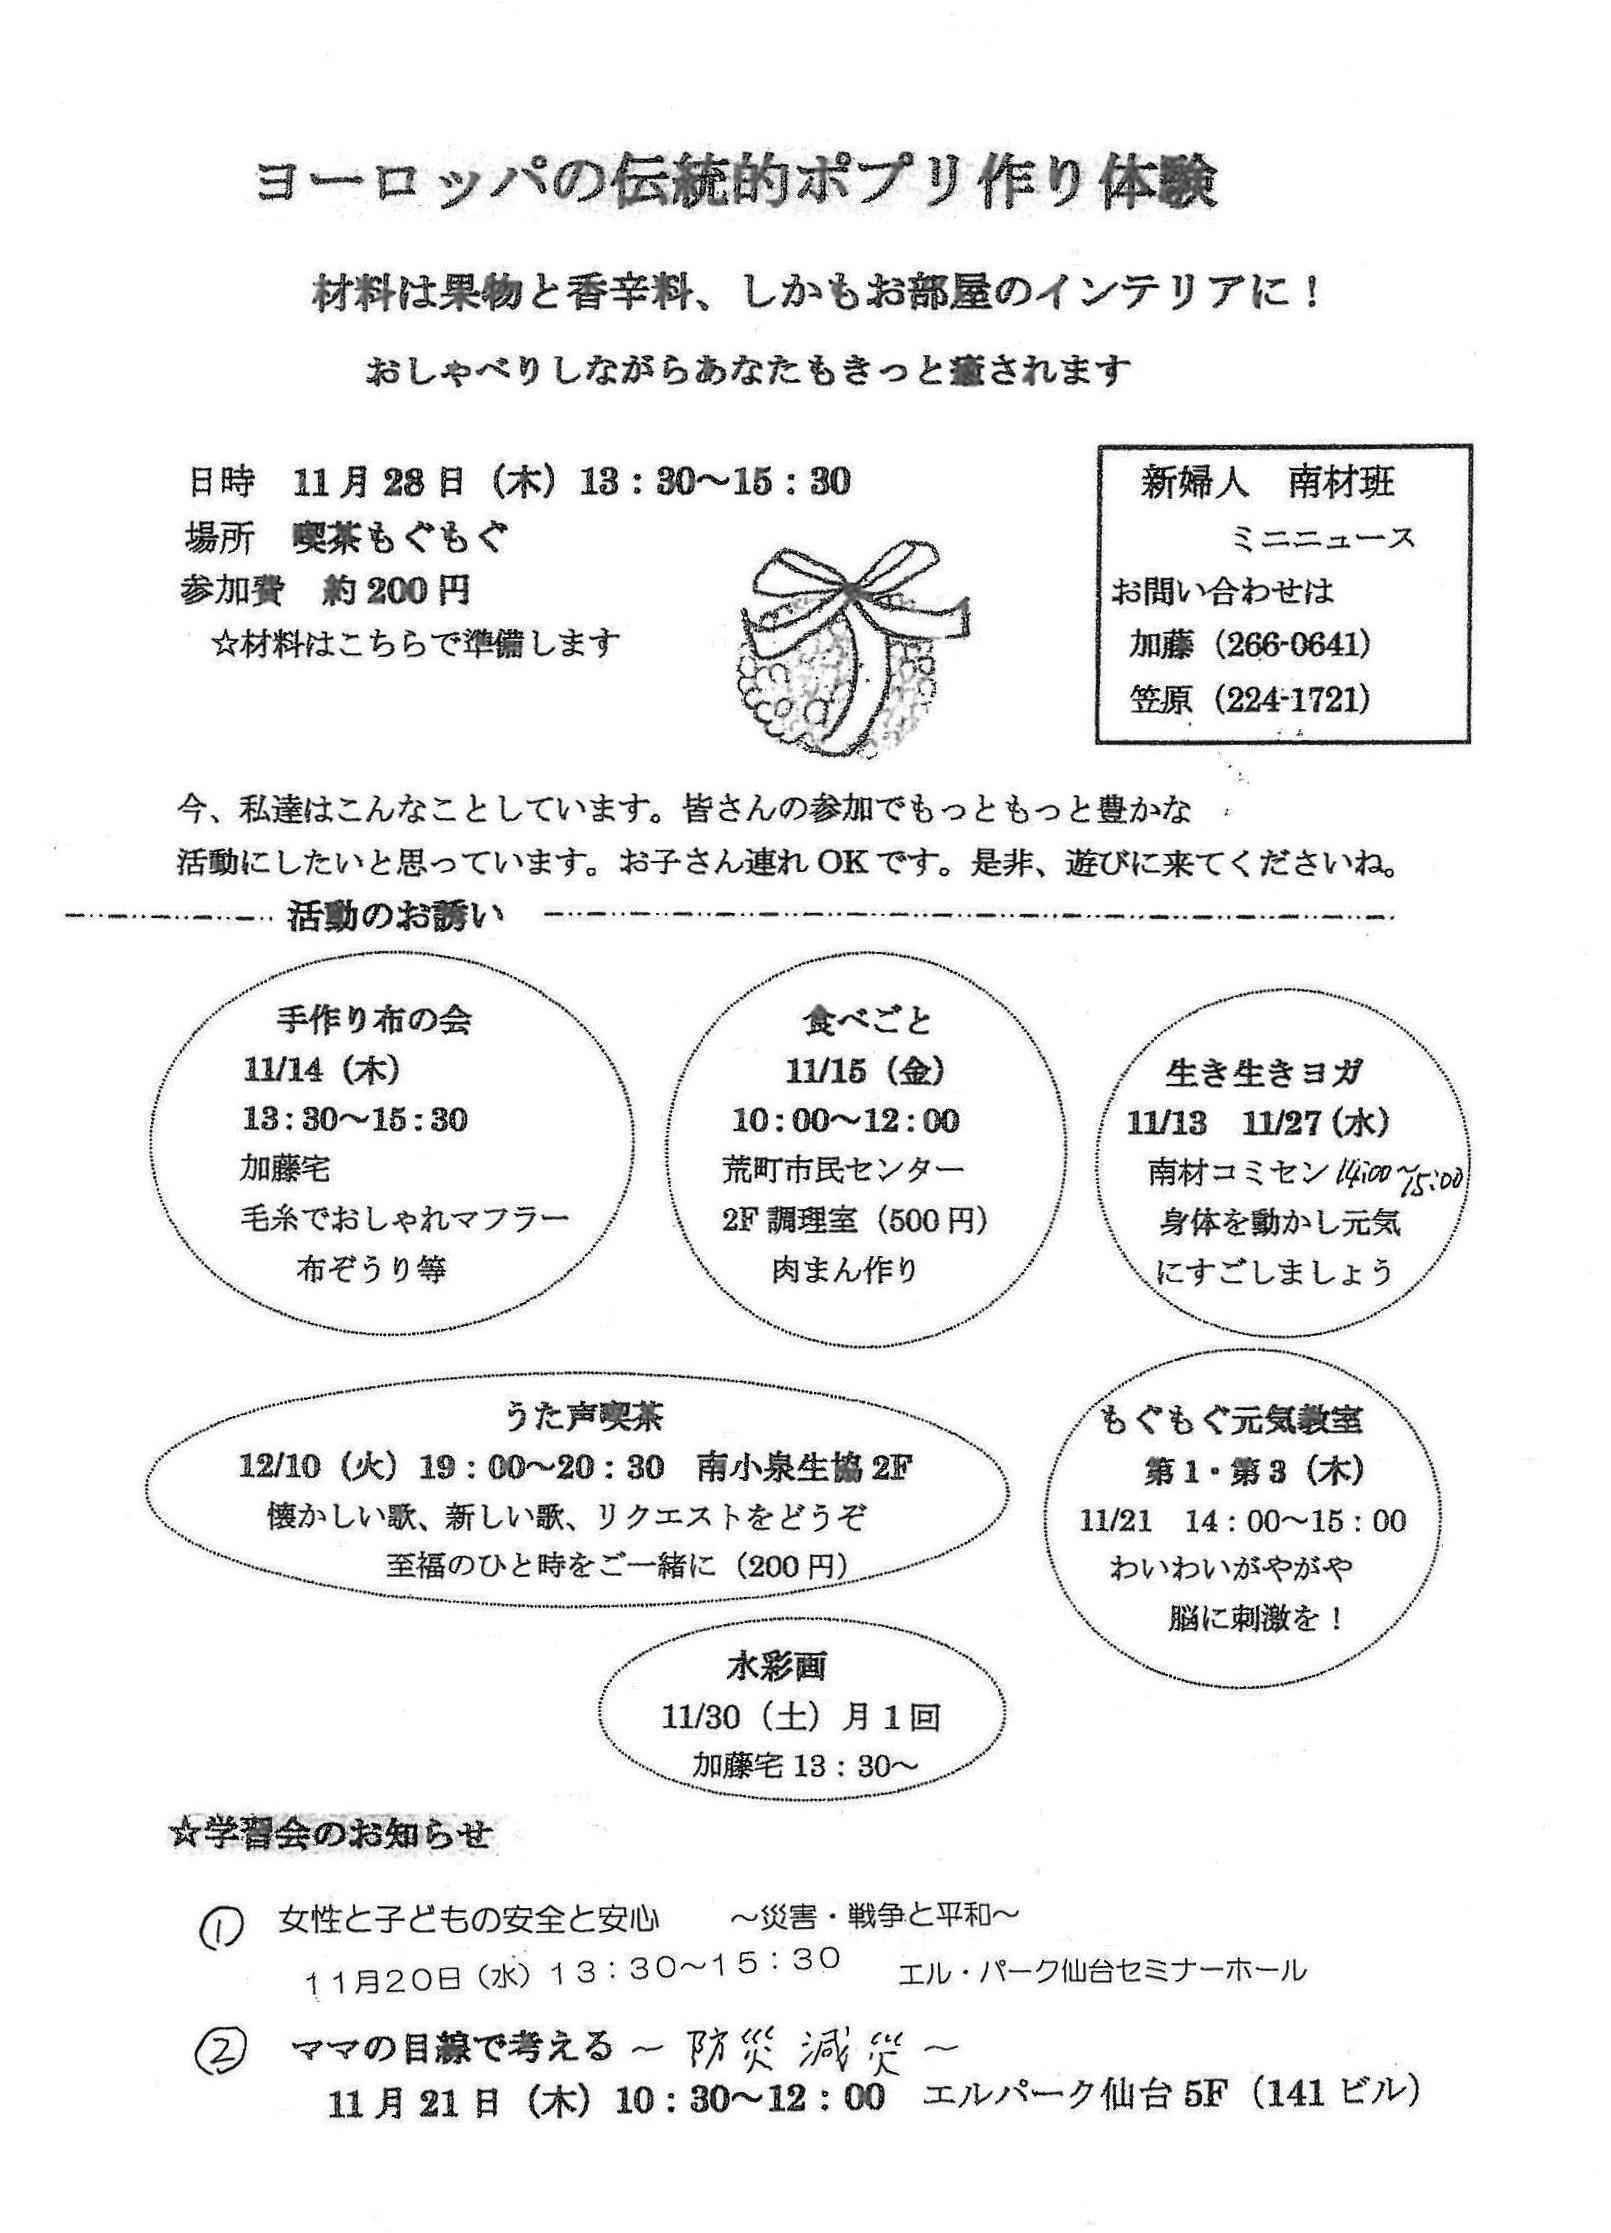 SKMBT_C22013111512190.jpg